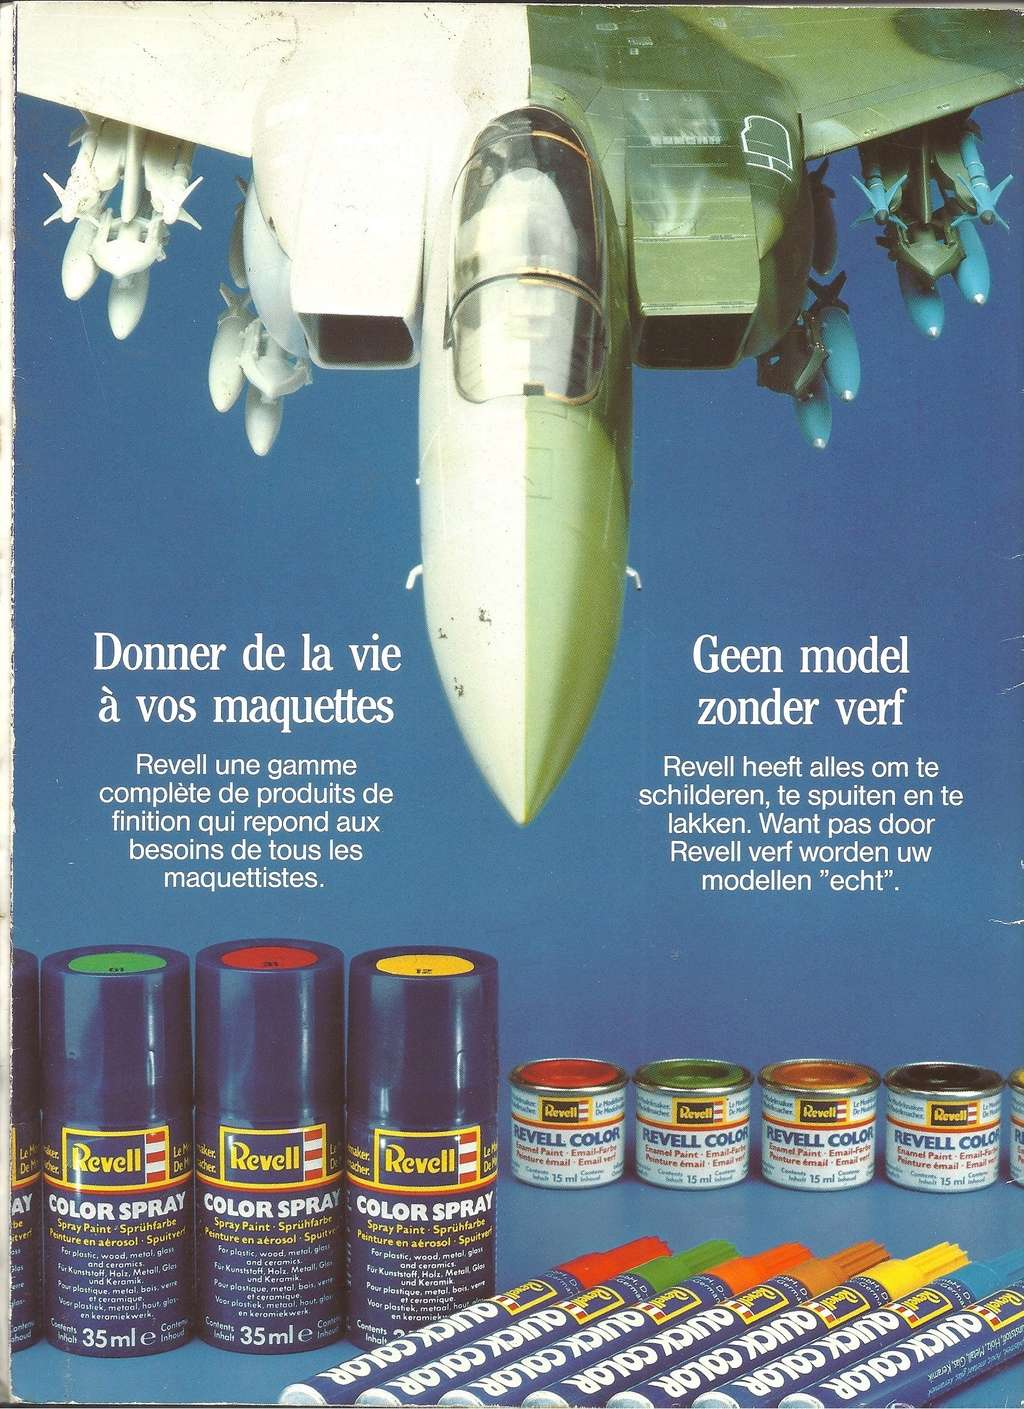 1984 - [REVELL 1984] Catalogue 1984  Revel230